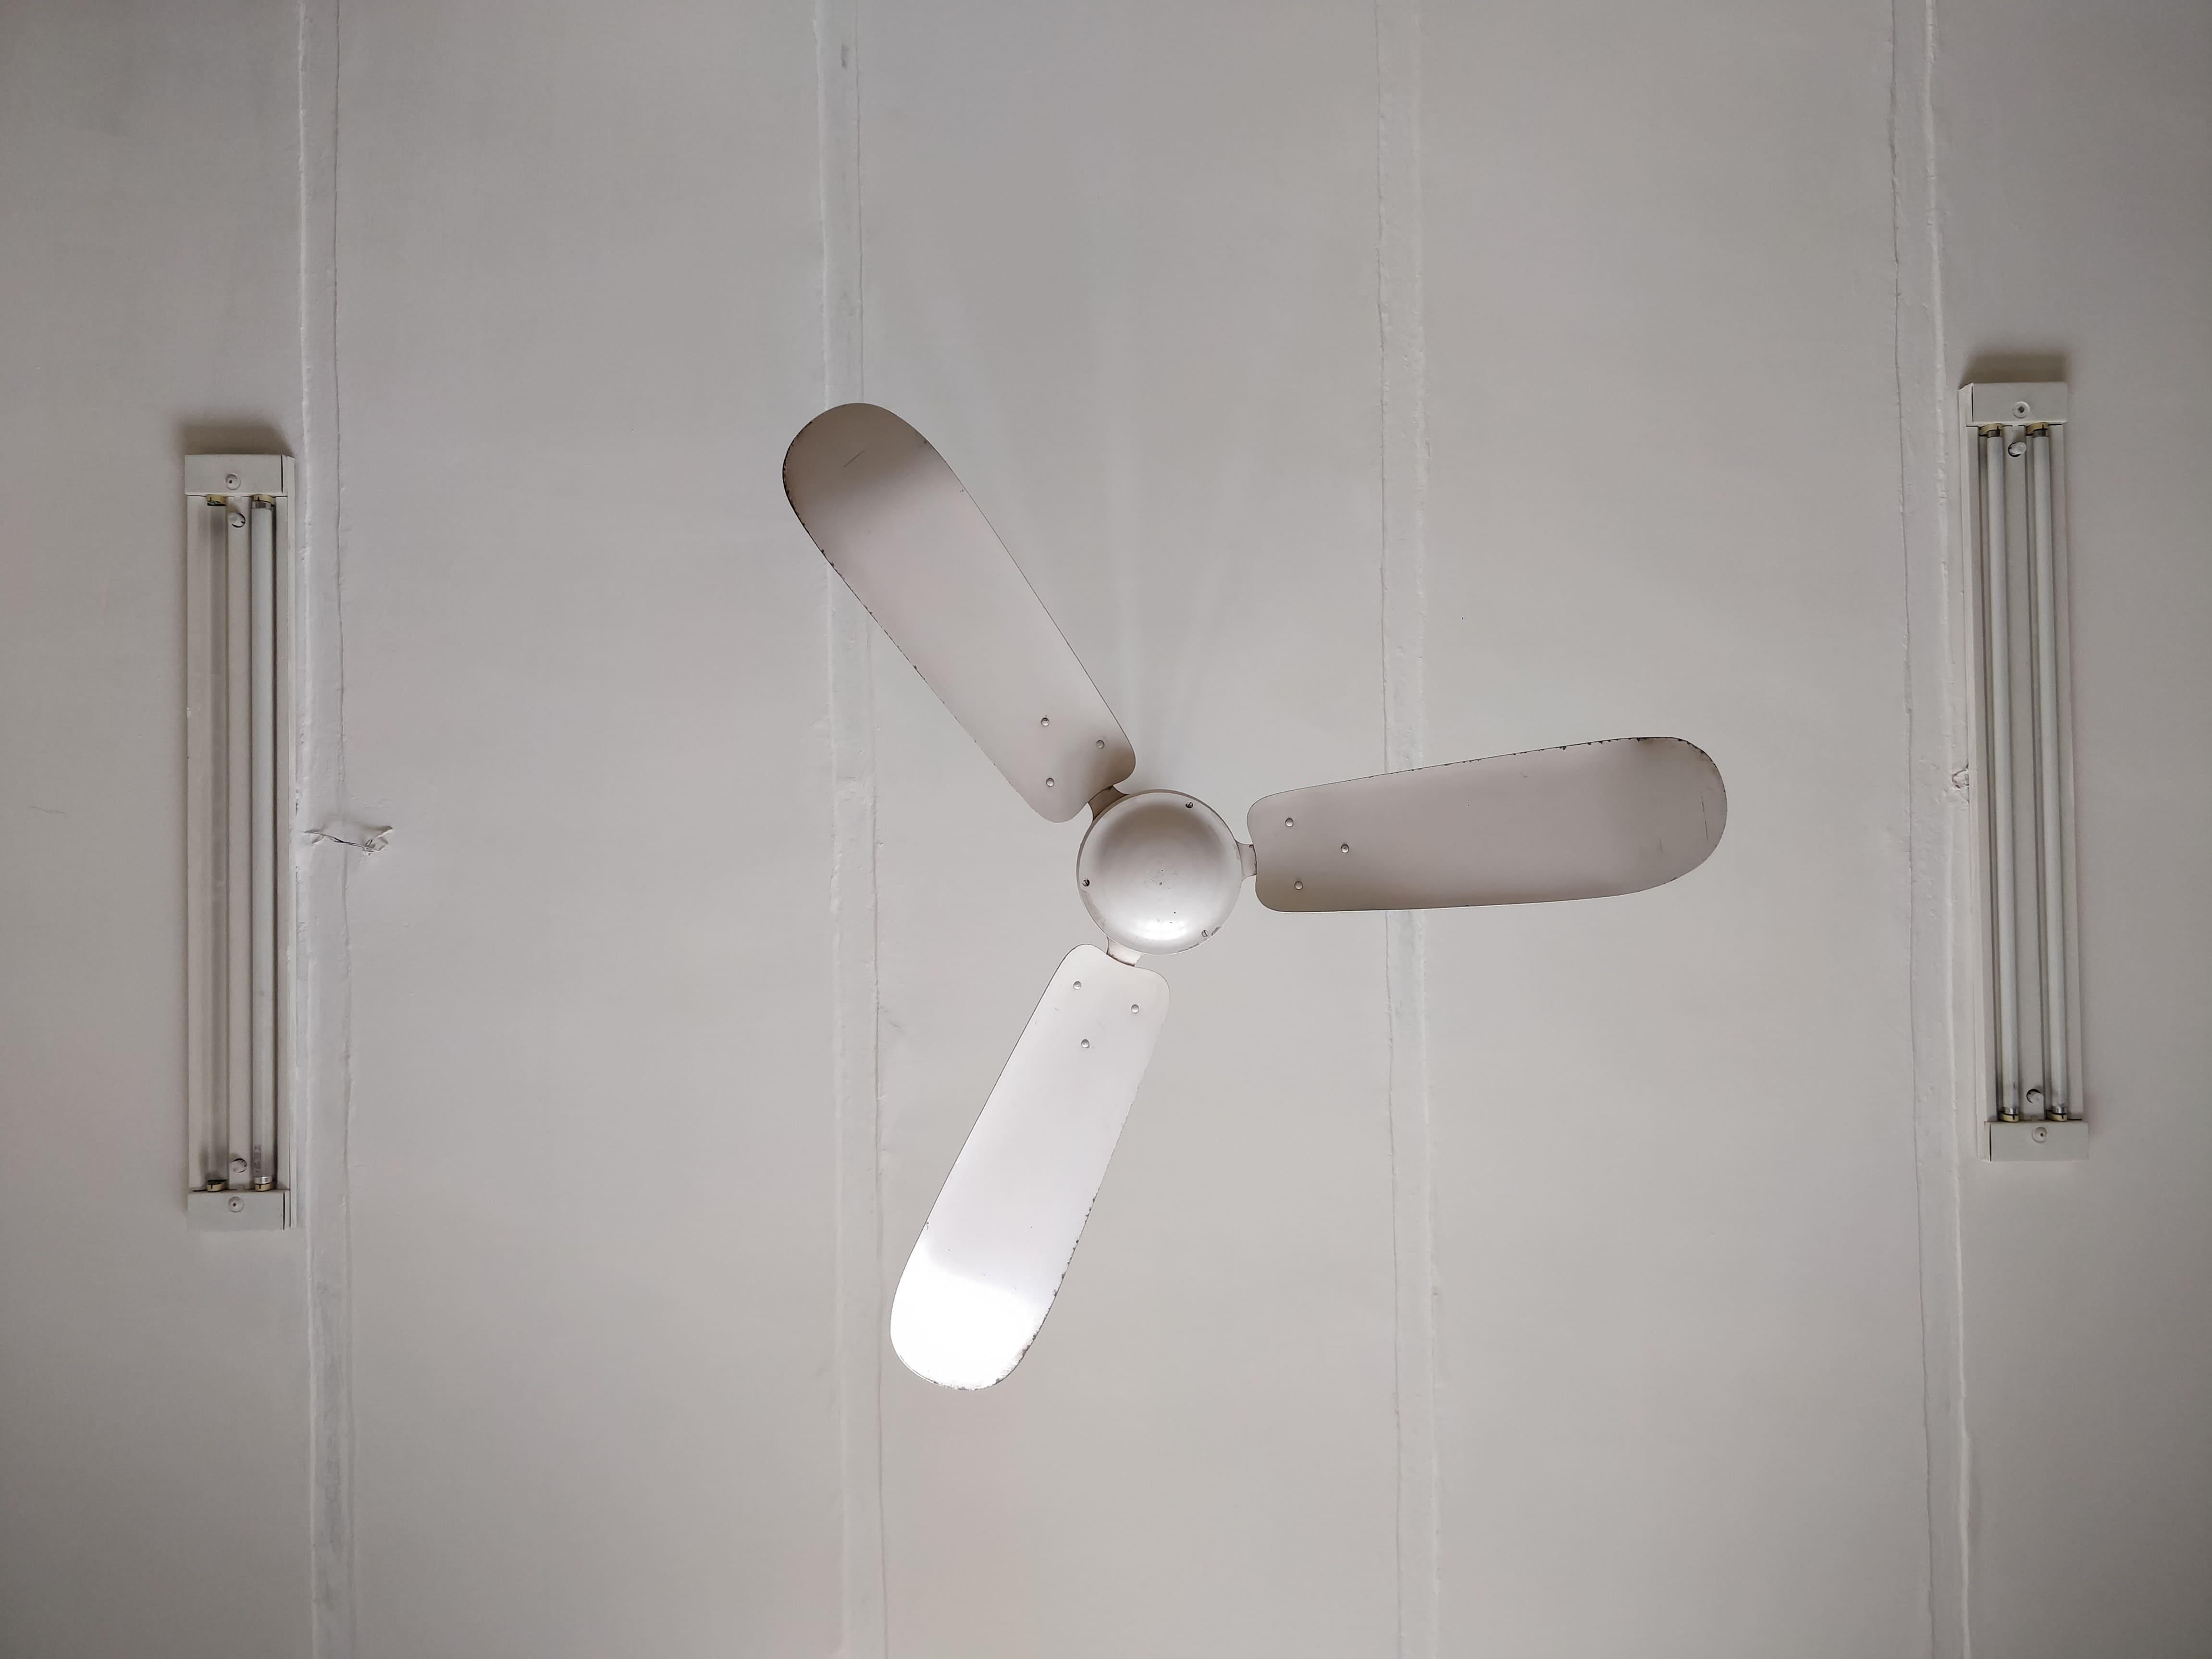 3 vantagens de um ventilador de teto